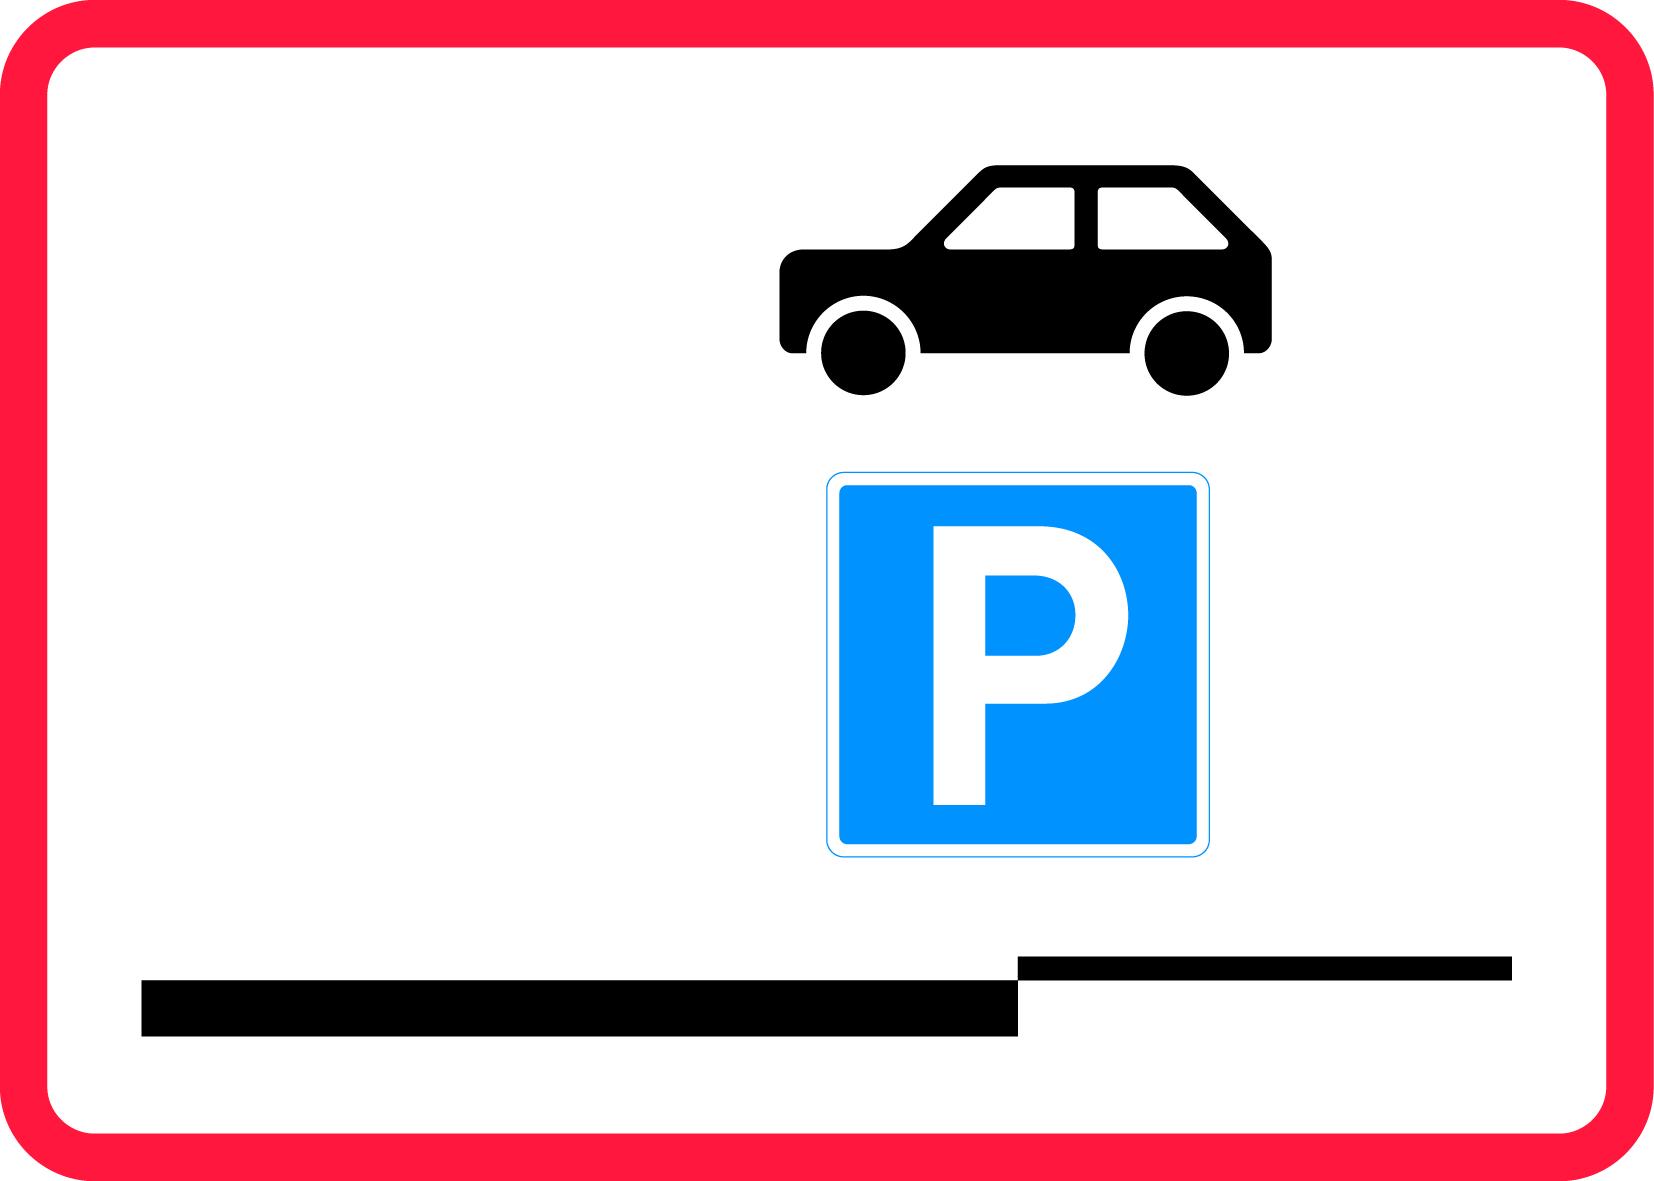 uc608_parkeringdelvisp_paa_fortov_tilladt